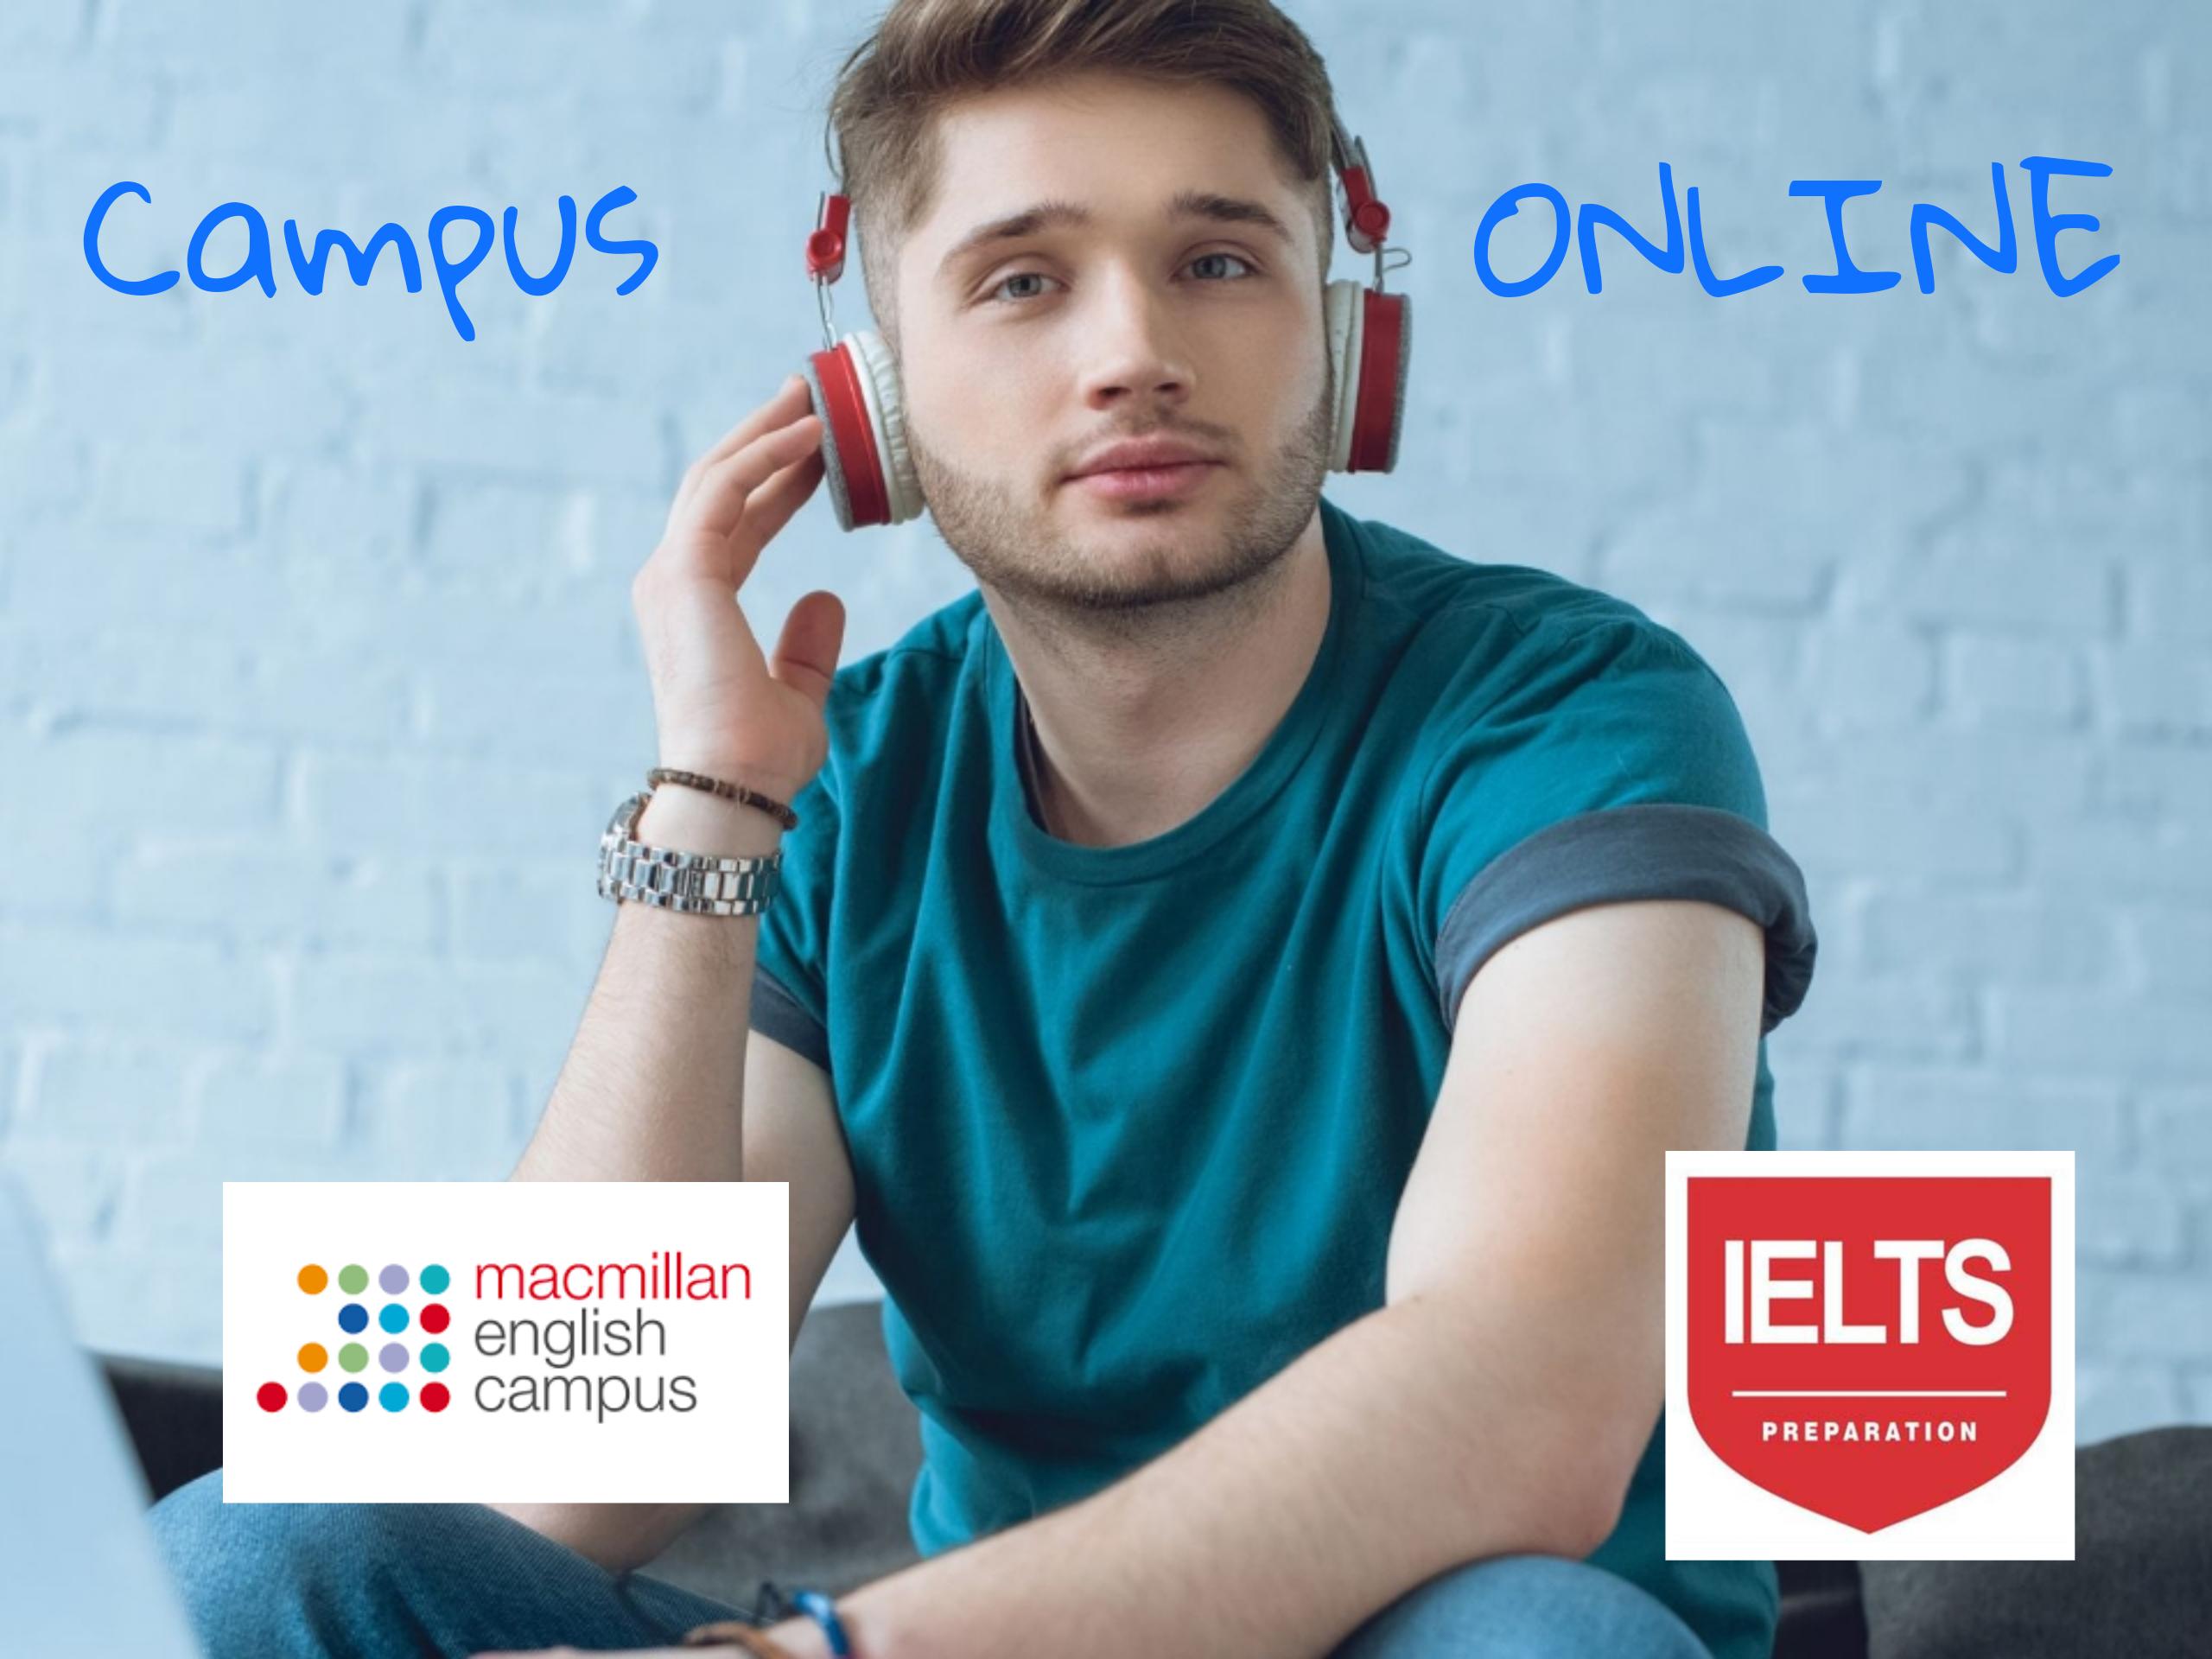 Cursos de Ingles Online Mirandas Academy Cambridge IELTS